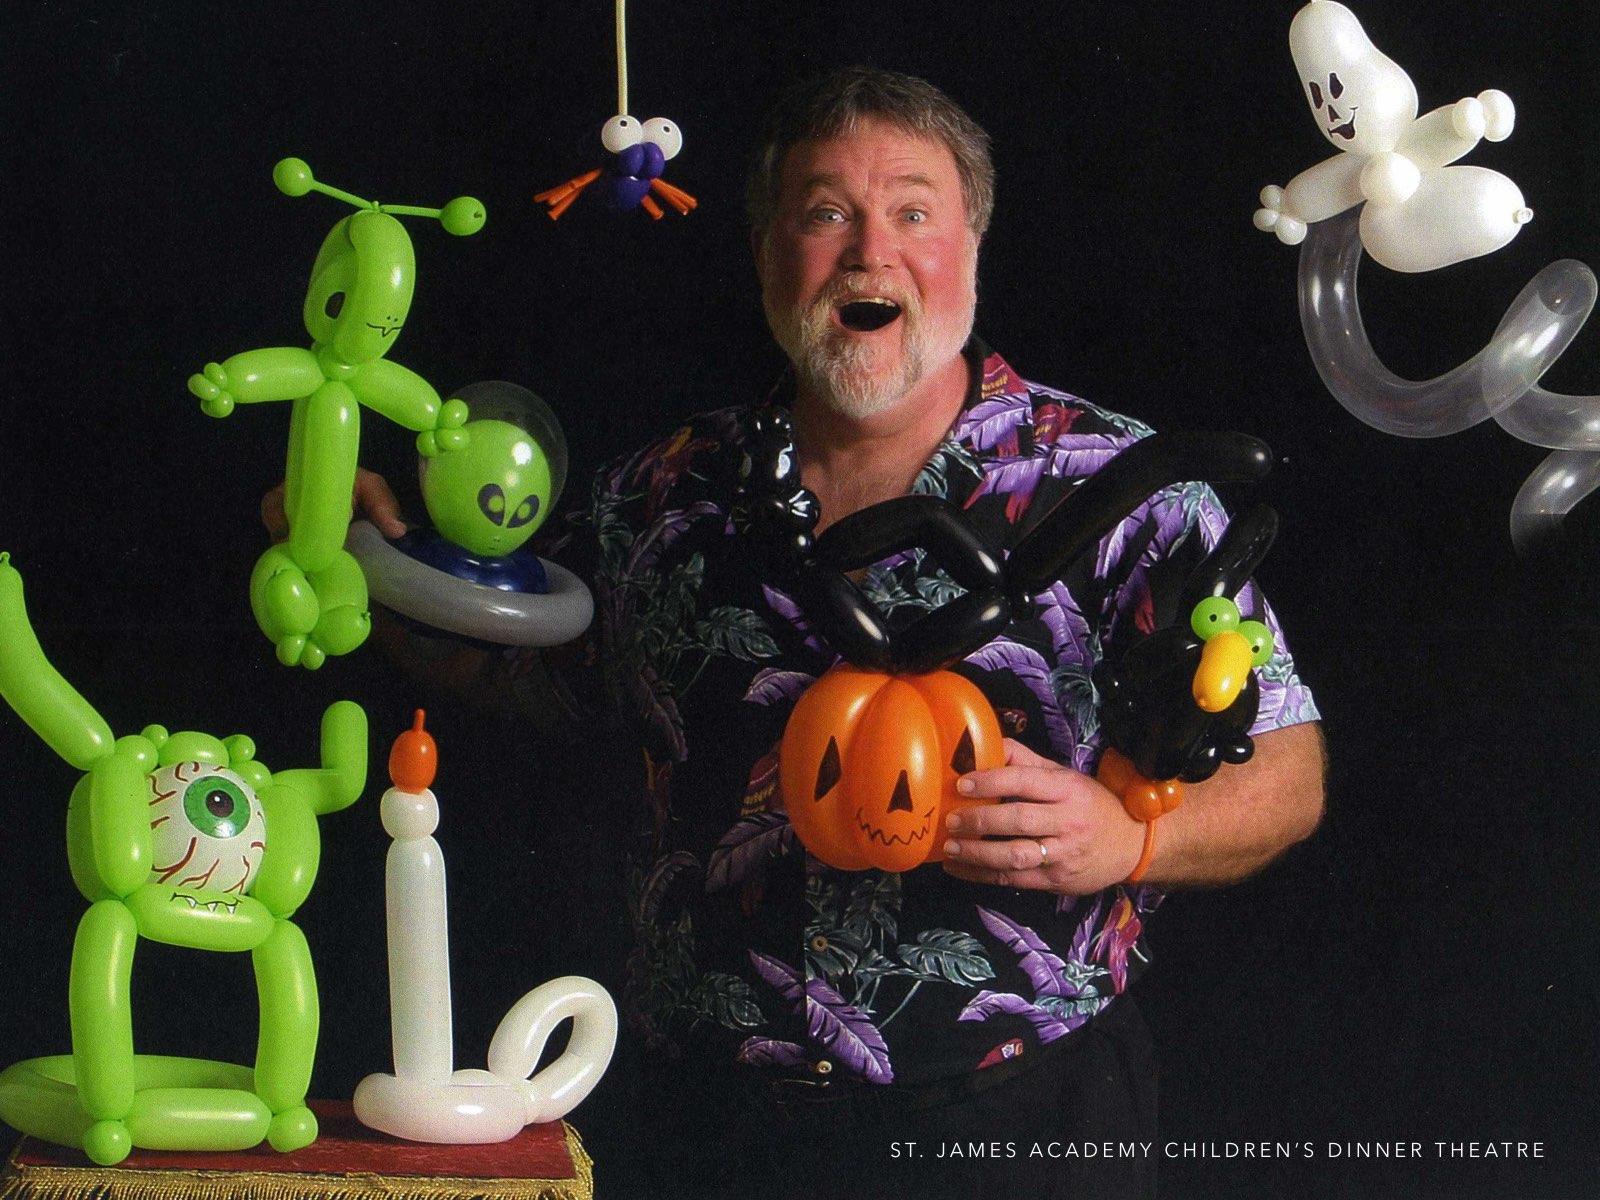 St. James Academy Children's Dinner Theatre - (cool) progeny